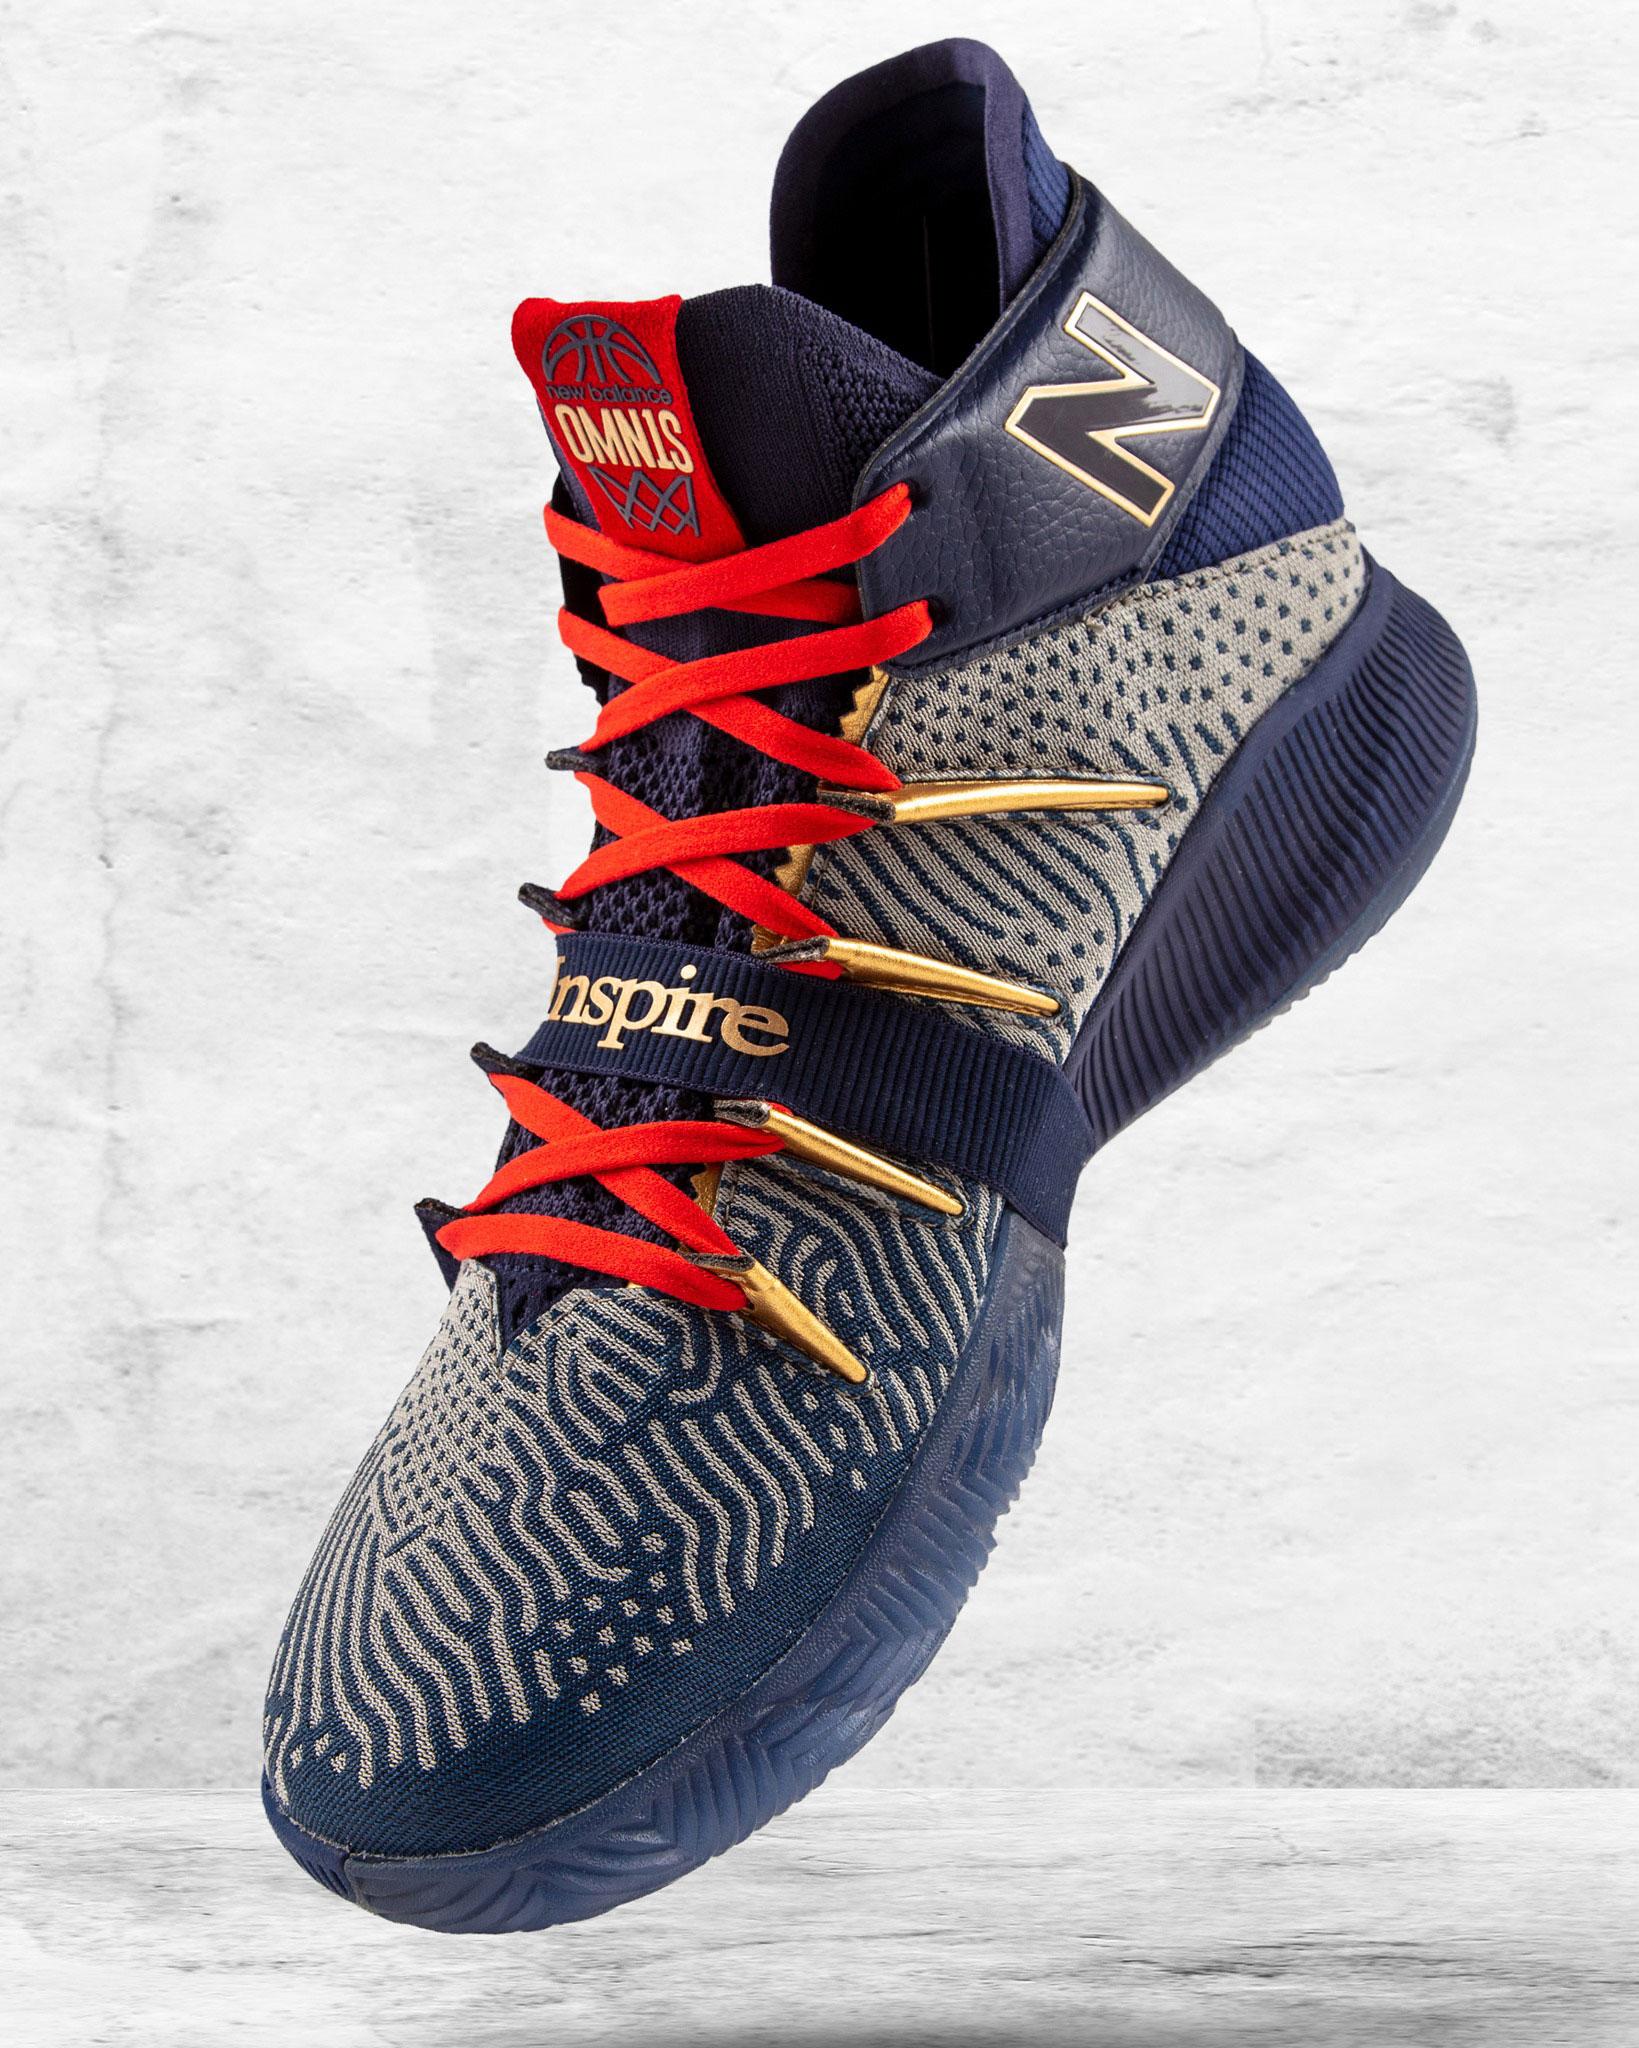 kawhi-leonard-inspire-the-dream-bhm-new-balance-OMN1S-shoe